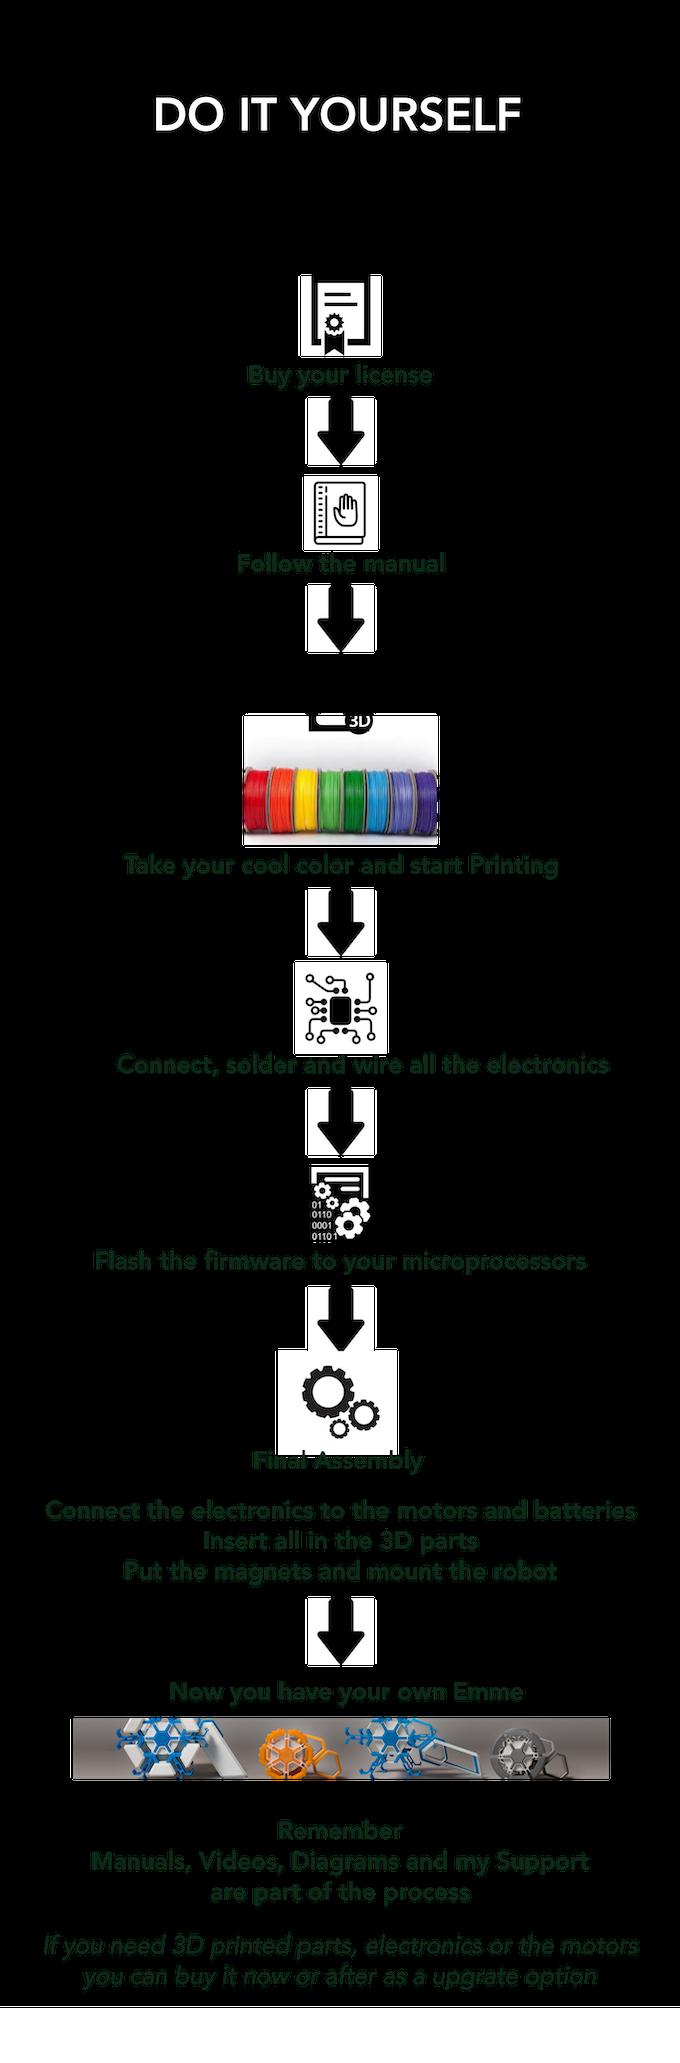 Emme technology is not complicated by salvador kickstarter click the logo to link arduino solutioingenieria Gallery